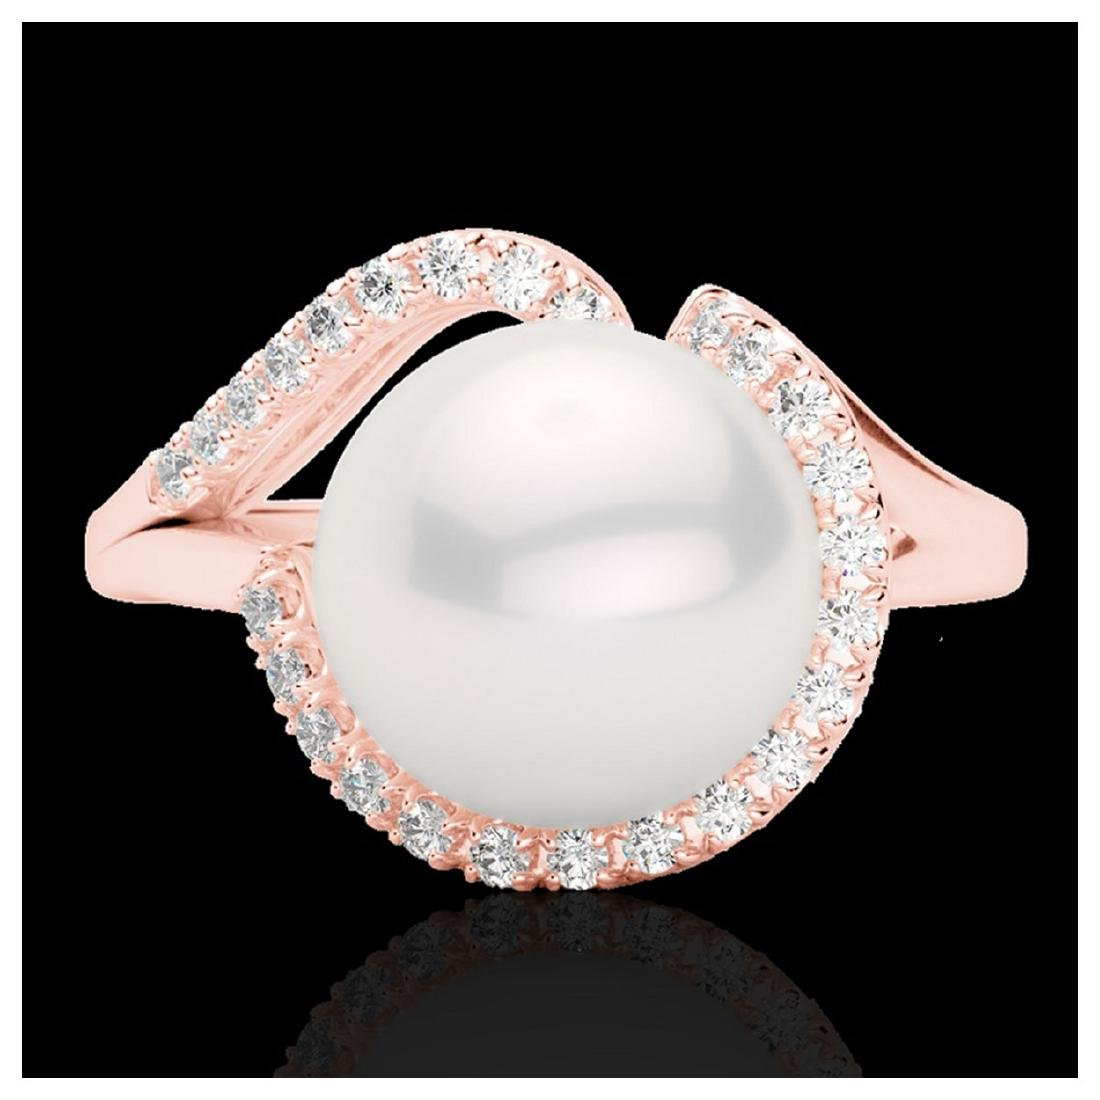 0.27 ctw VS/SI Diamond & White Pearl Ring 14K Rose Gold